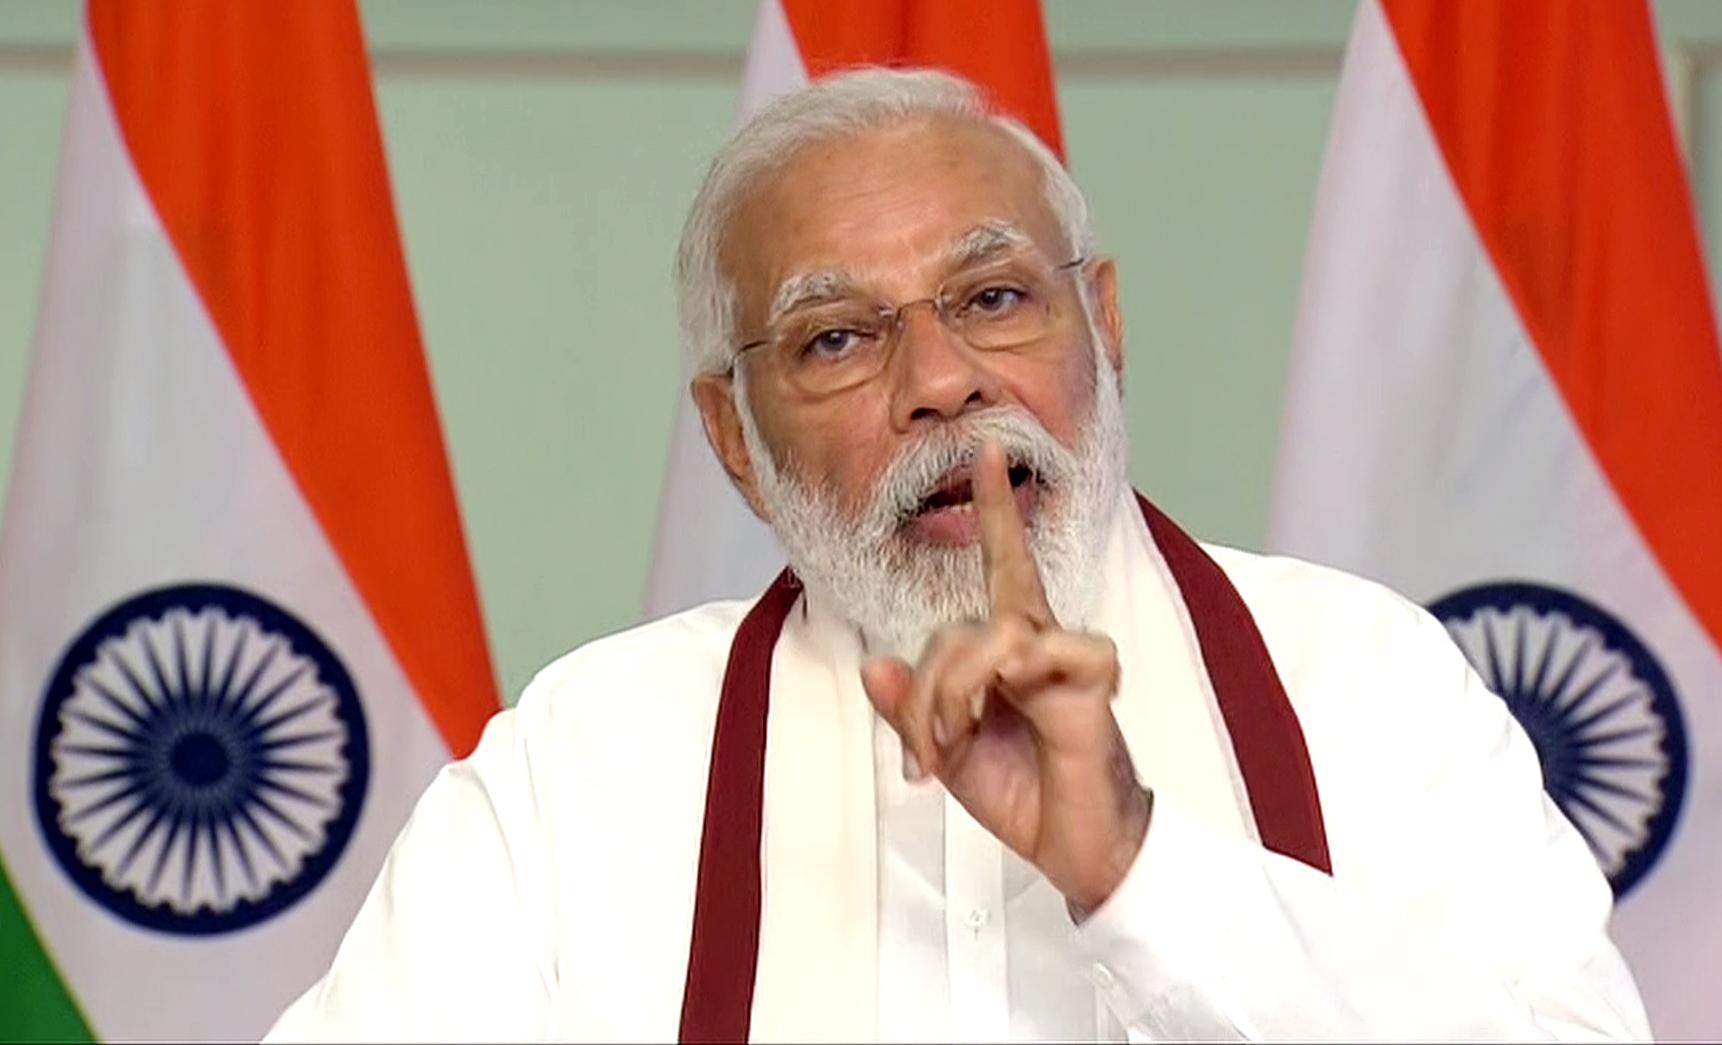 New Delhi, June 27 (ANI): Prime Minister Narendra Modi addresses during the 90th birthday celebrations of the Rev. Dr. Joseph Mar Thoma Metropolitan via video conferencing, in New Delhi on Saturday. (ANI Photo)